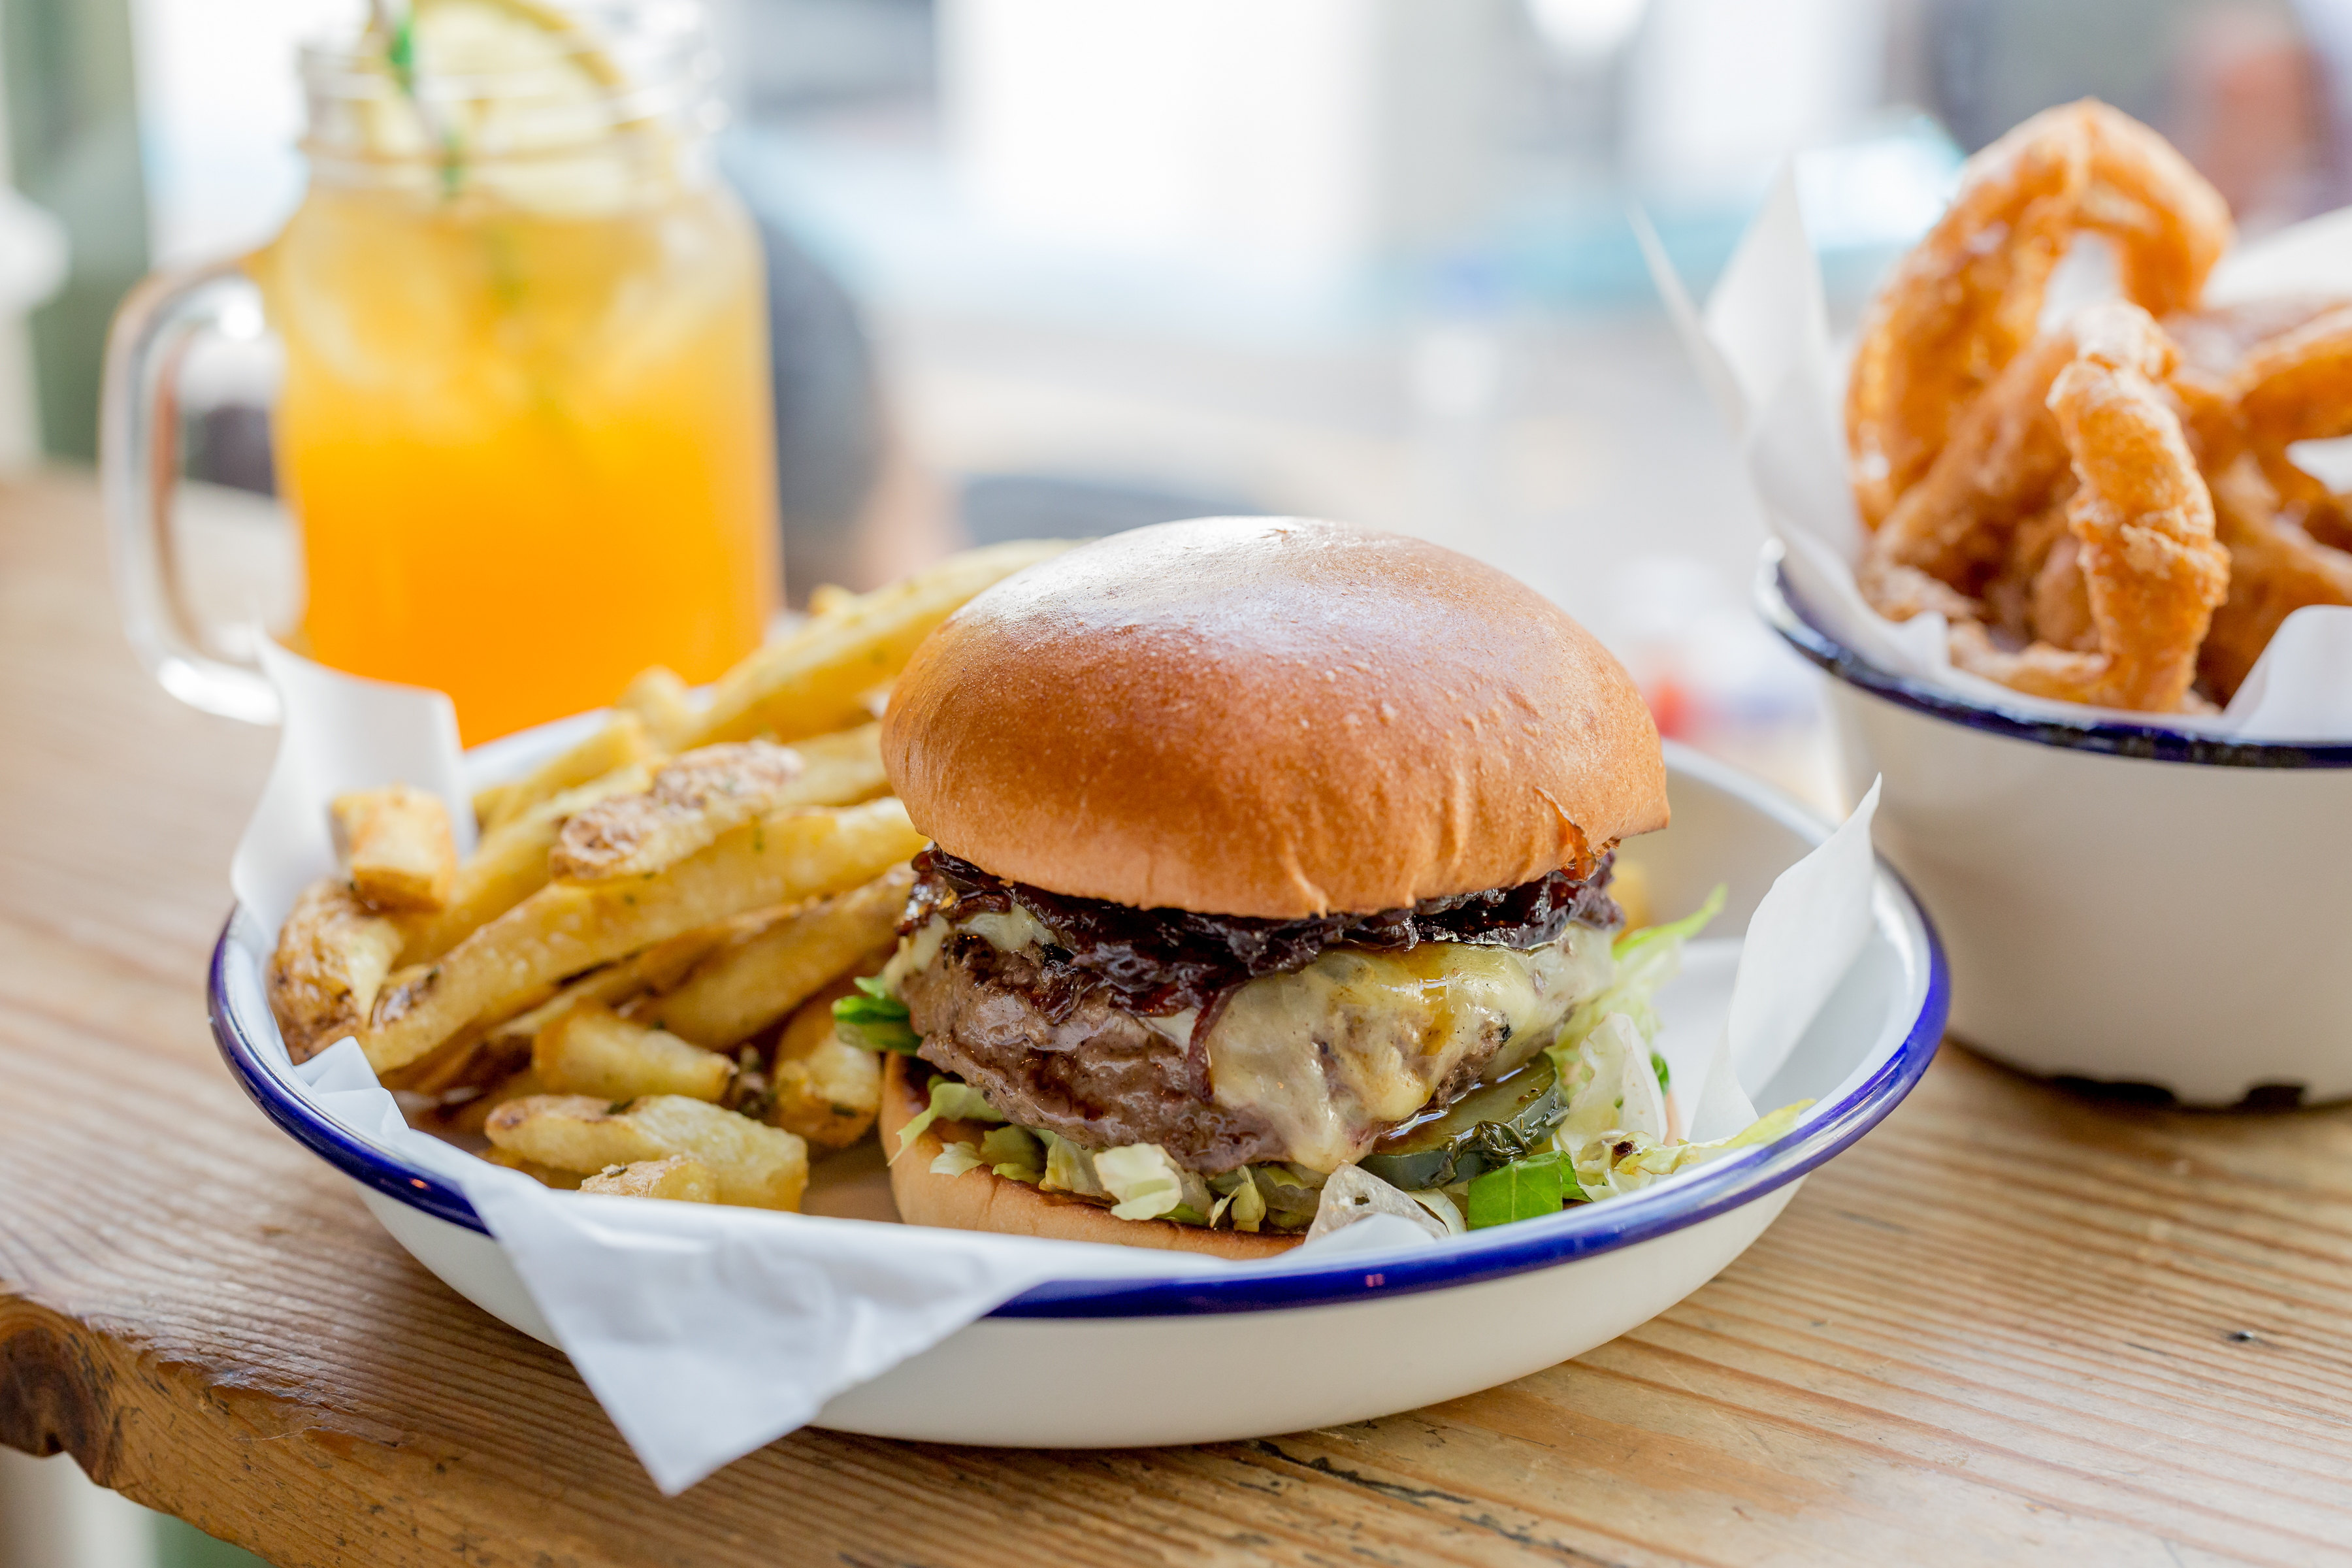 Burger and onion rings at Honest Burgers, London